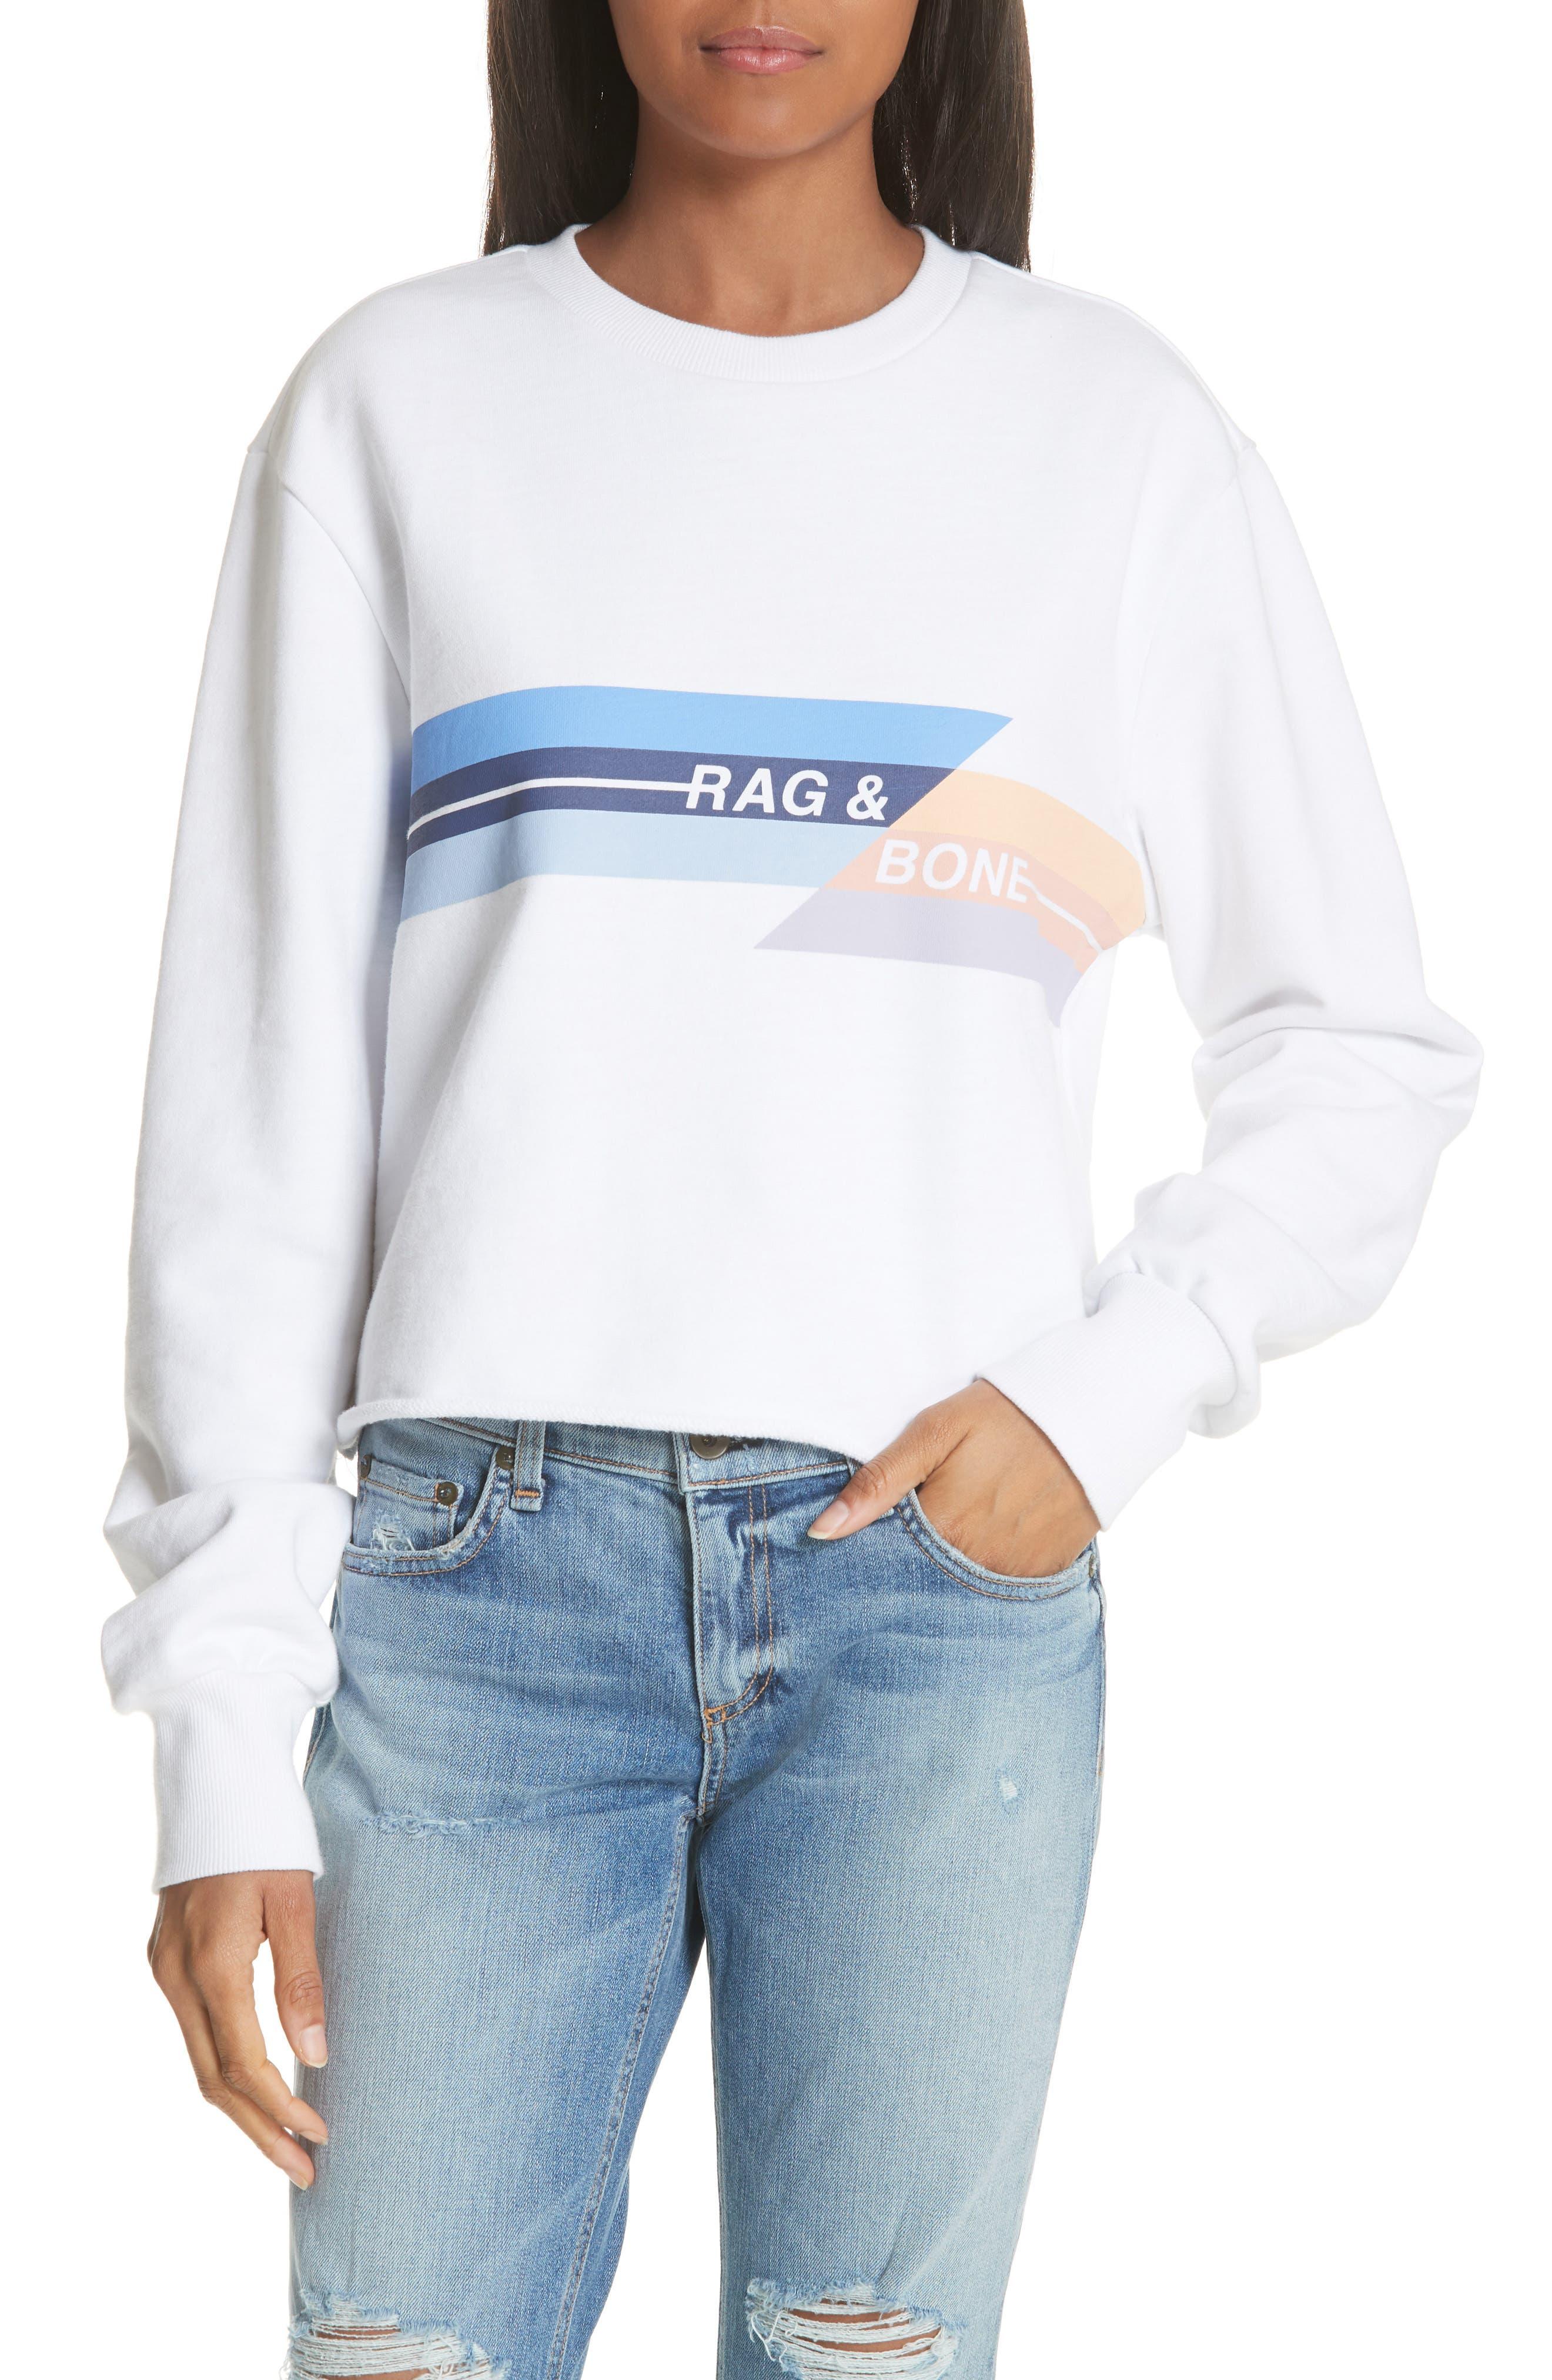 JEAN Glitch Crop Sweatshirt,                             Main thumbnail 1, color,                             100